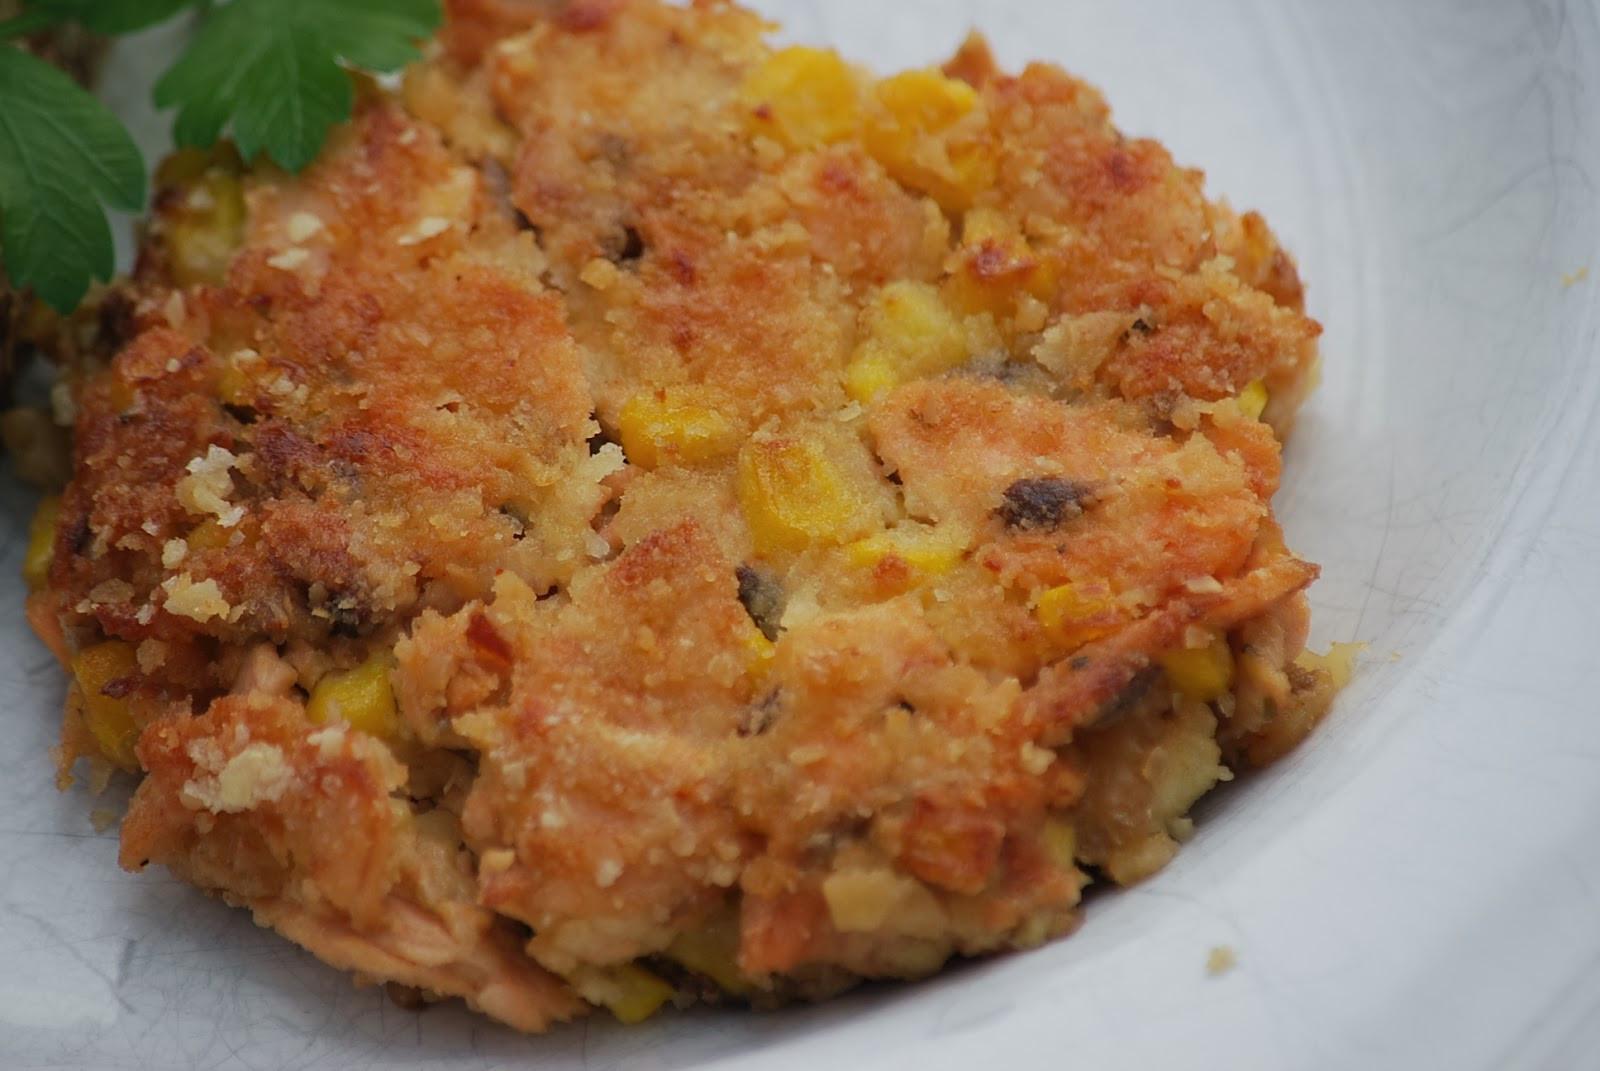 Salmon Cake Recipe  My story in recipes Salmon Cakes